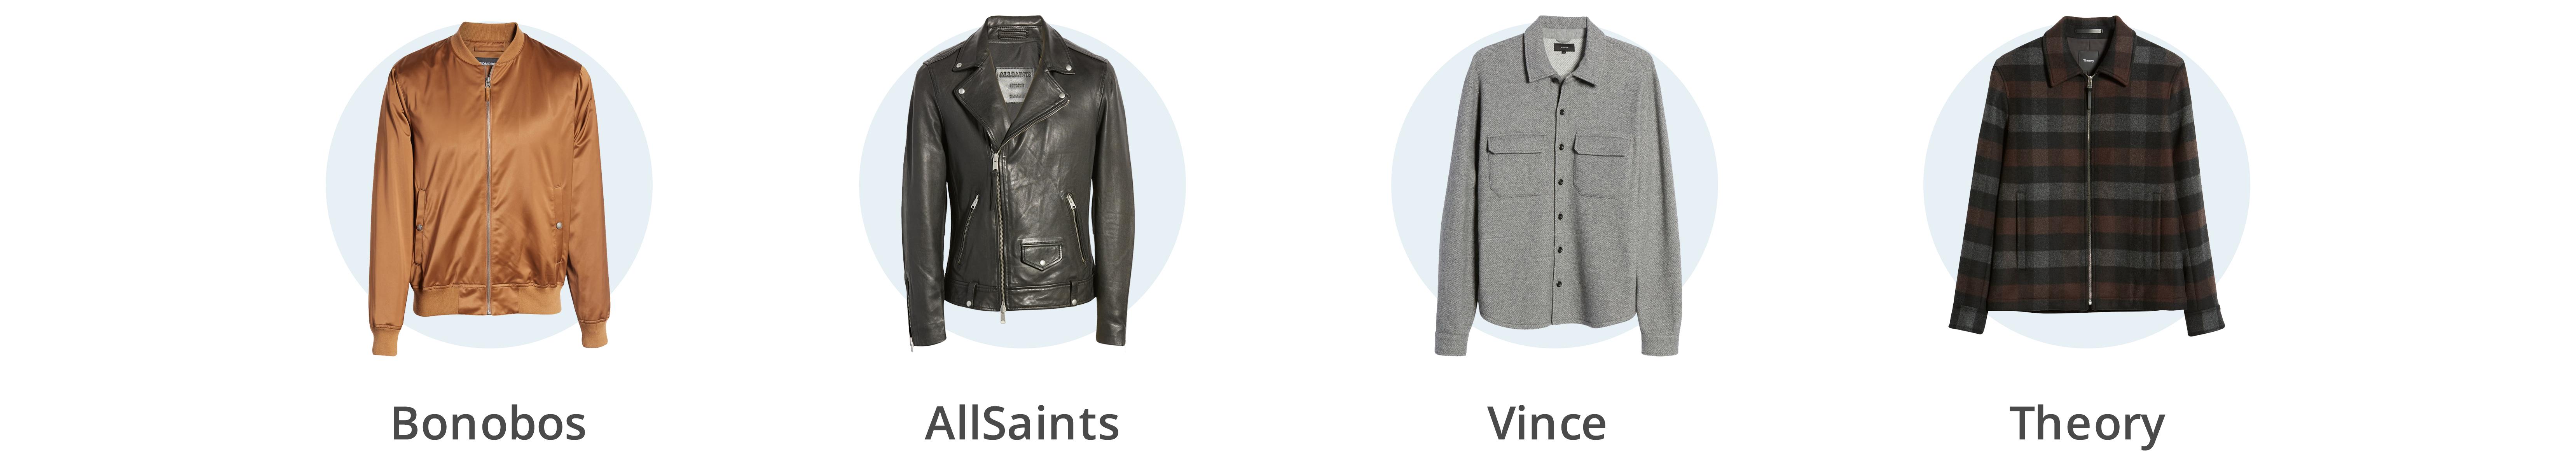 Men's lightweight winter coats